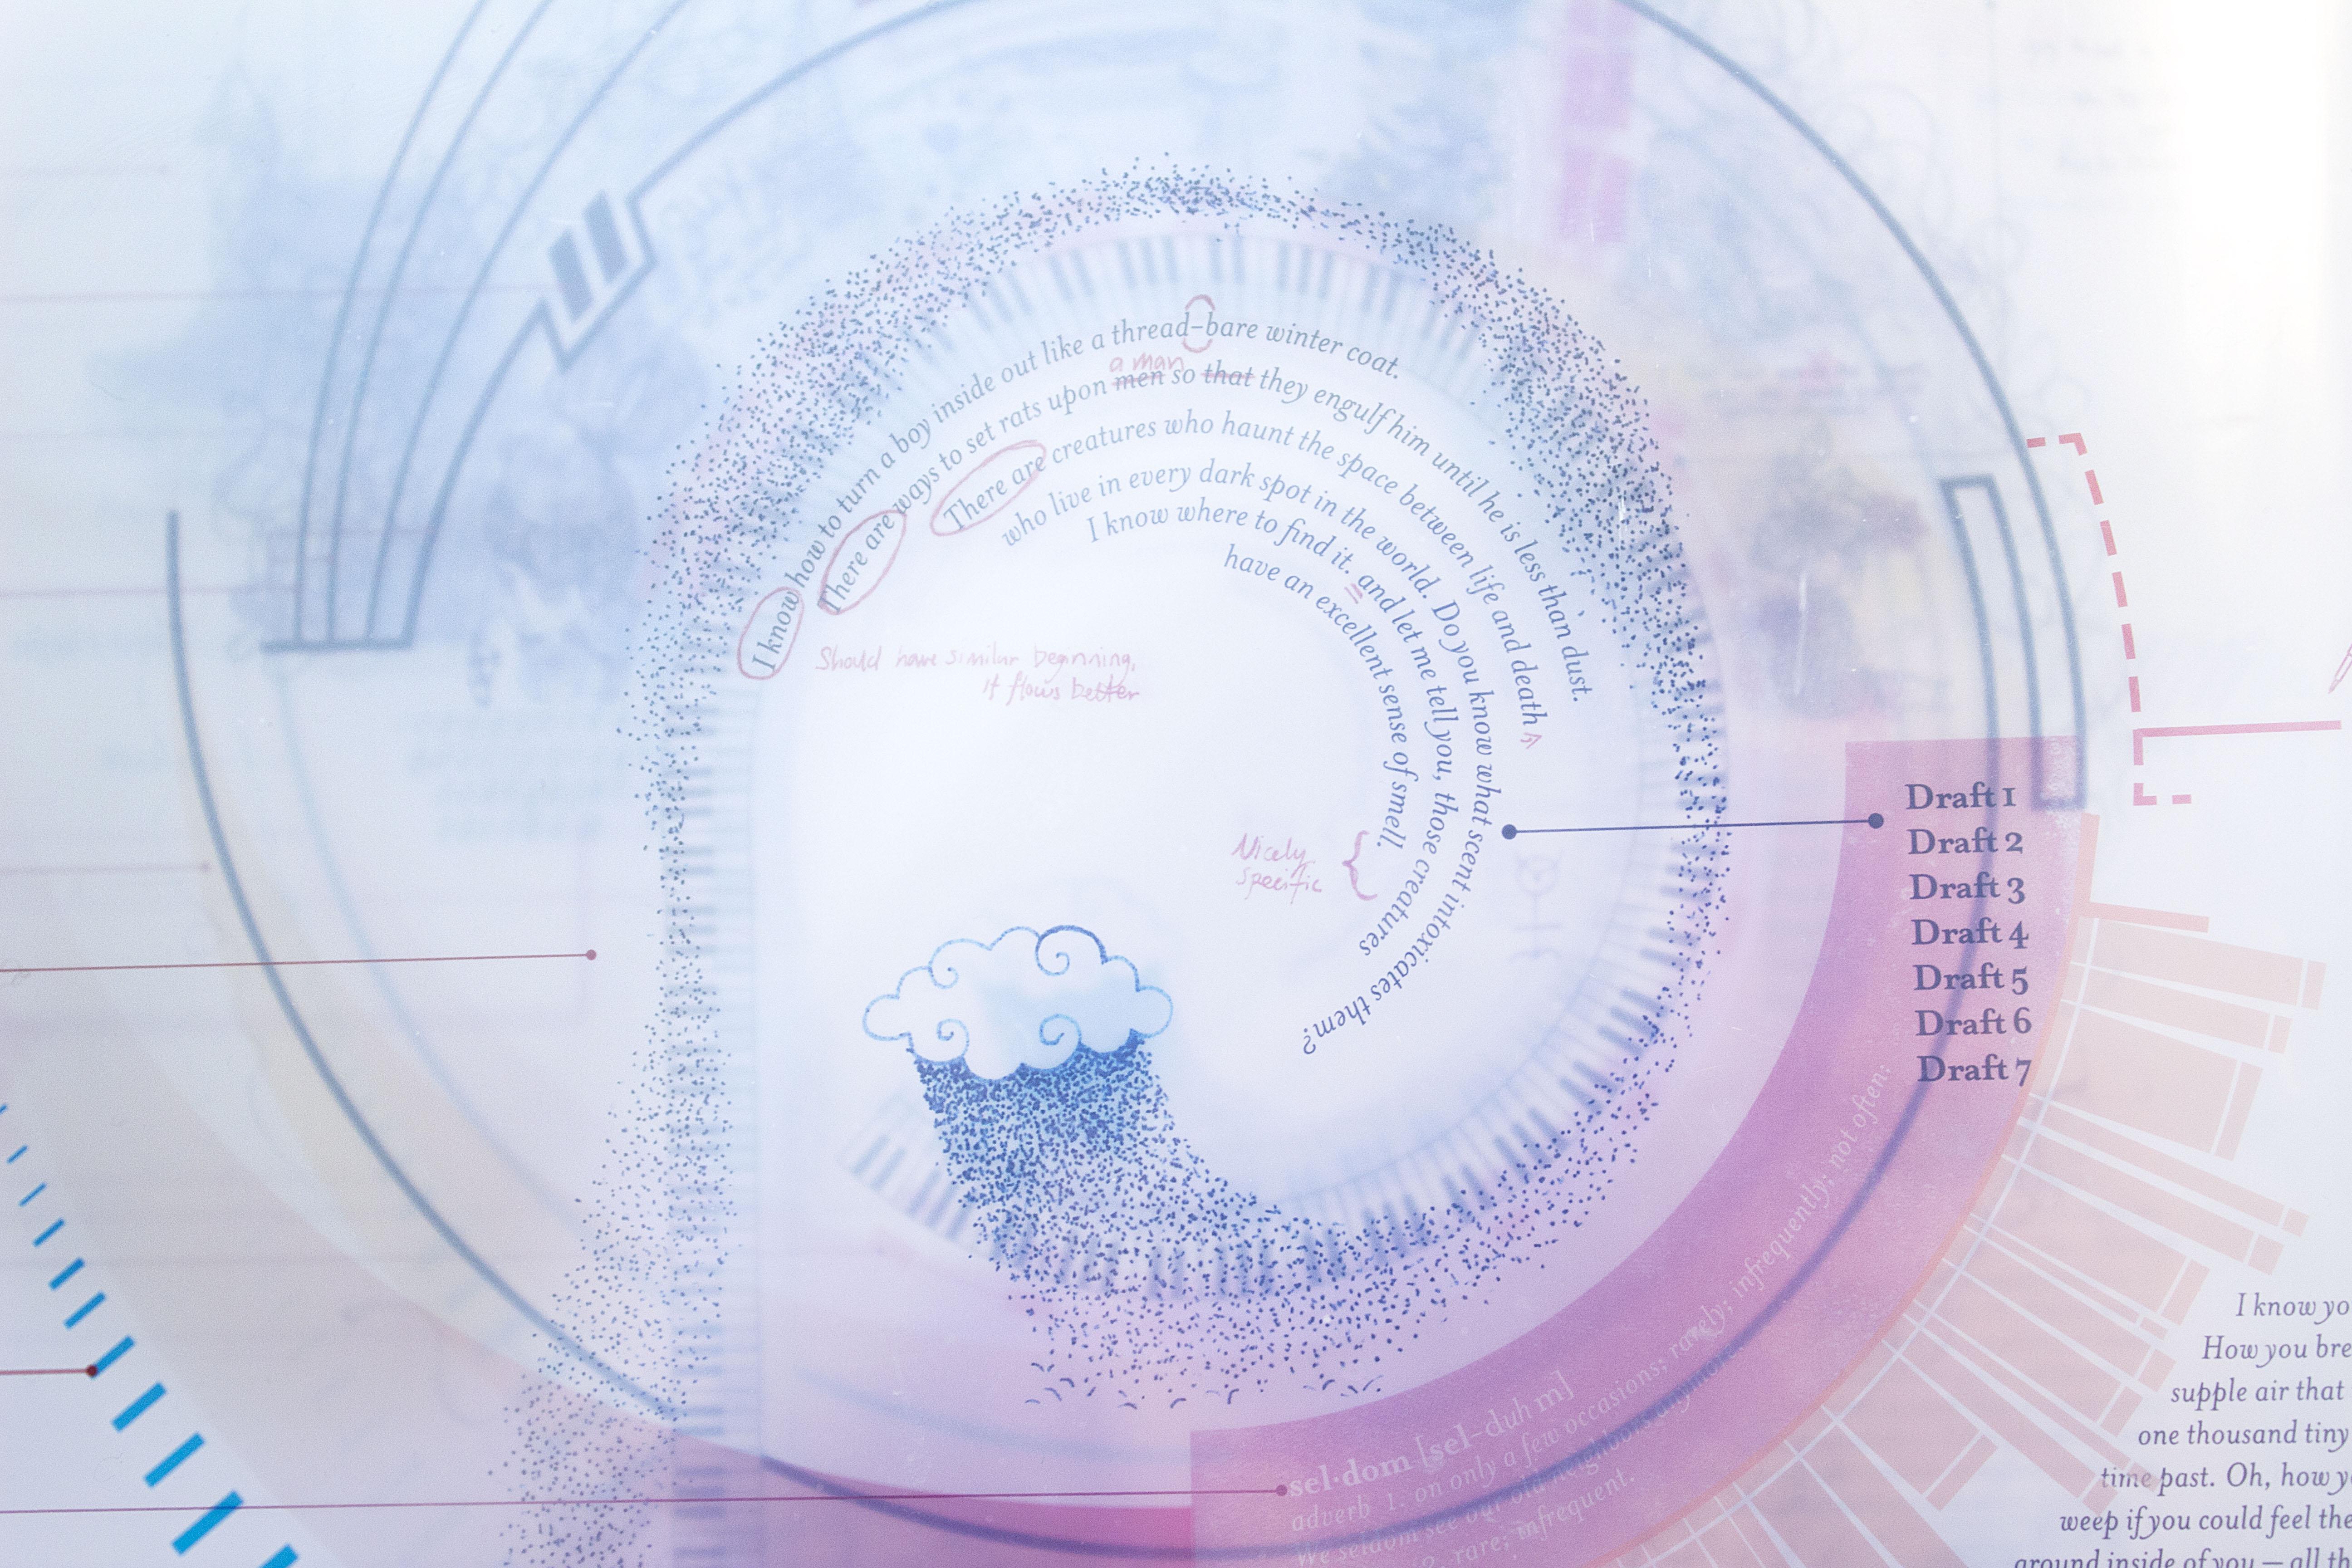 An Atlas of the Creative Process